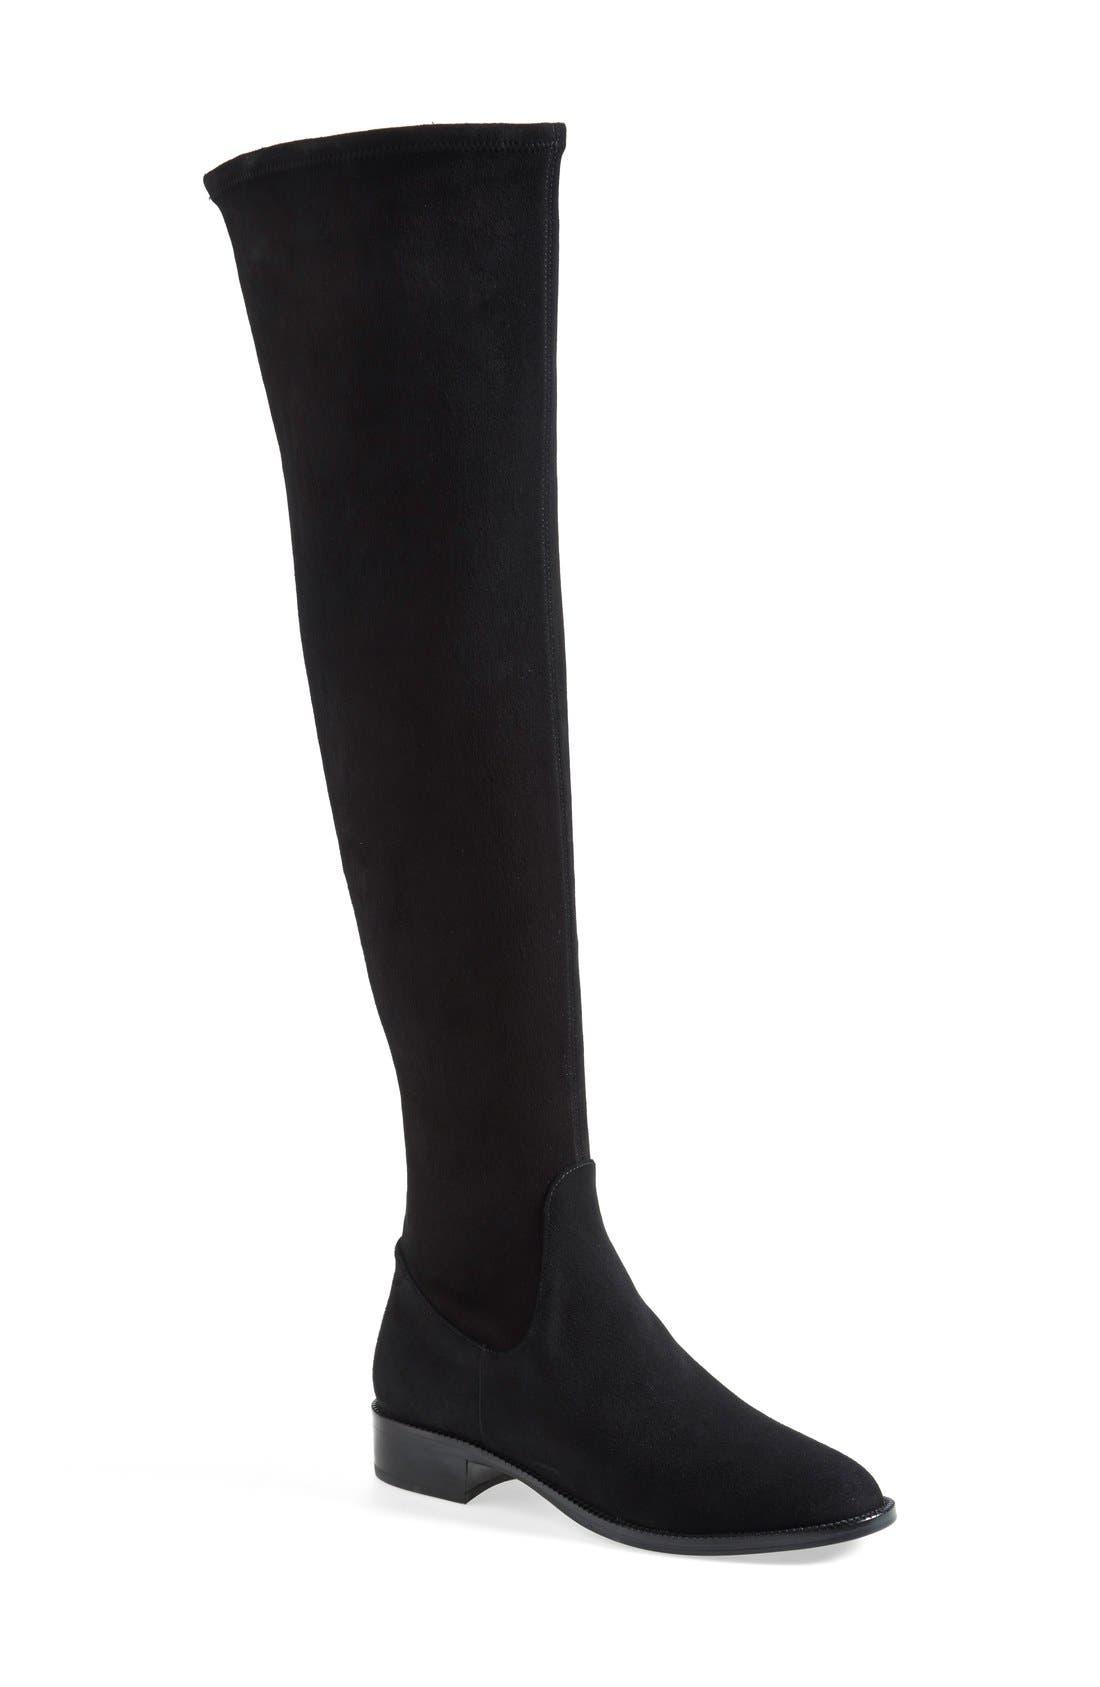 Main Image - Via Spiga 'Boni' Over the Knee Boot (Women)